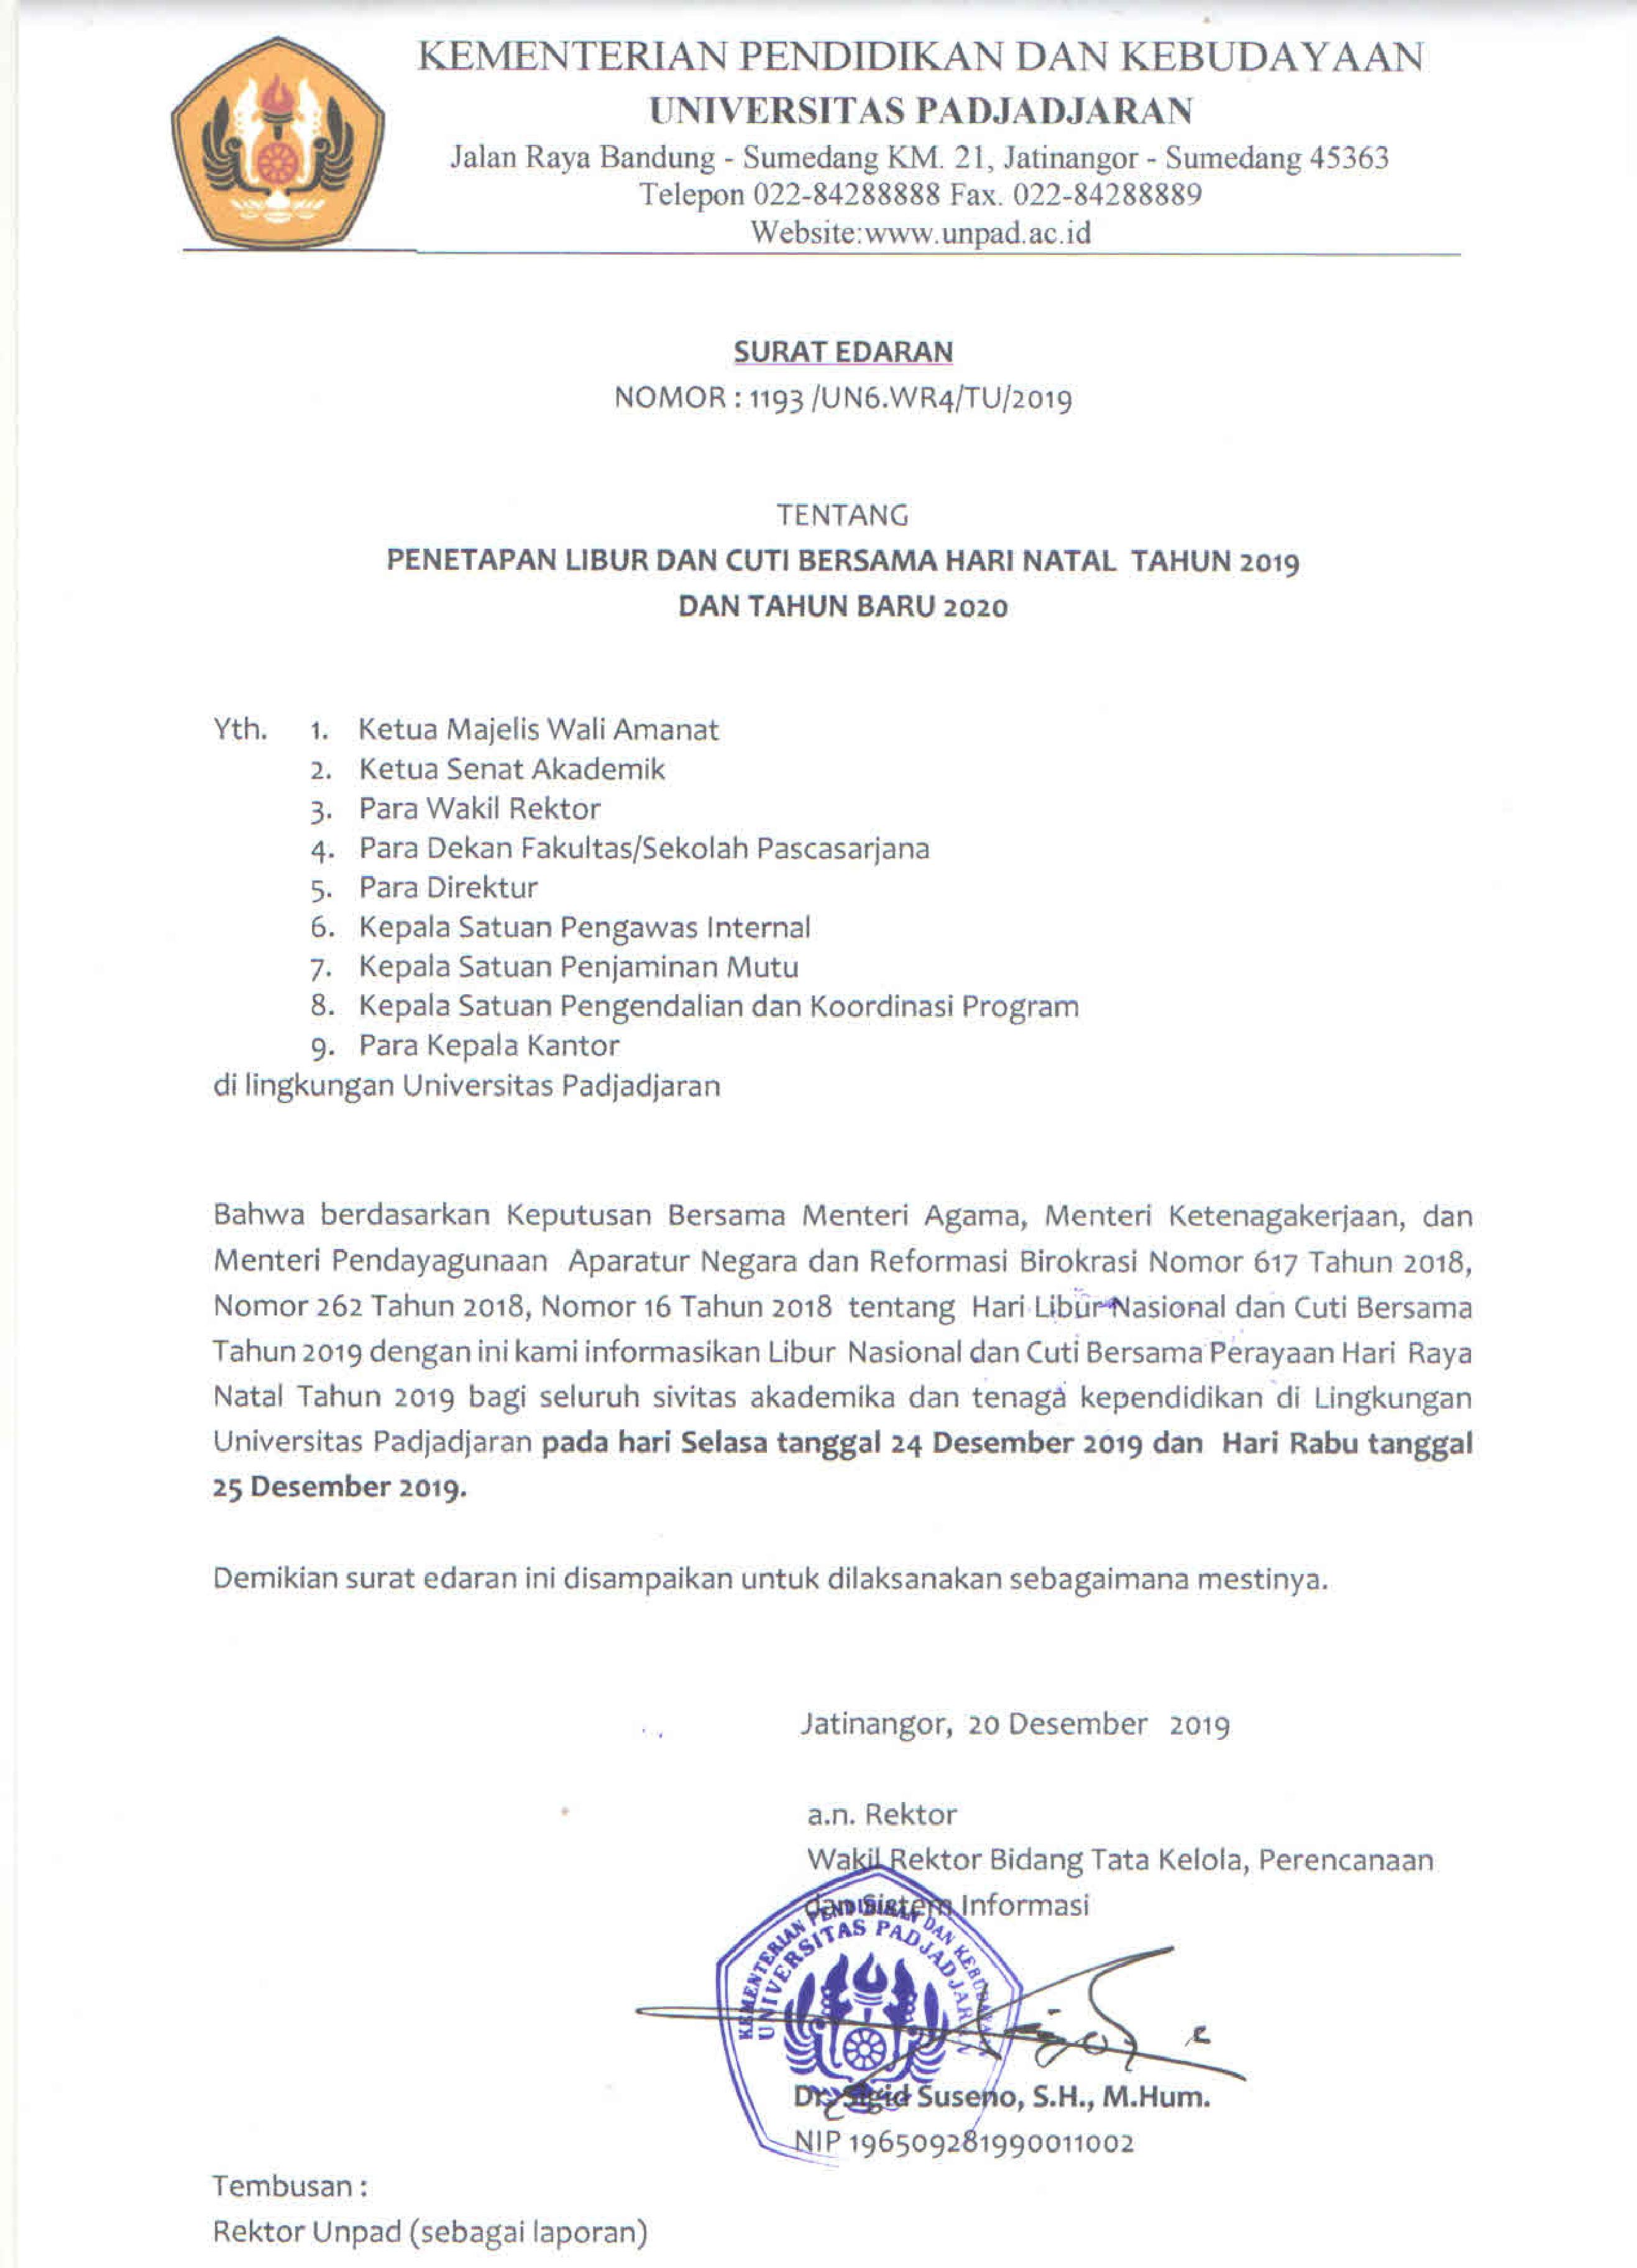 Edaran Penetapan Libur Dan Cuti Bersama Hari Natal Tahun 2019 Dan Tahun Baru 2020 Universitas Padjadjaran